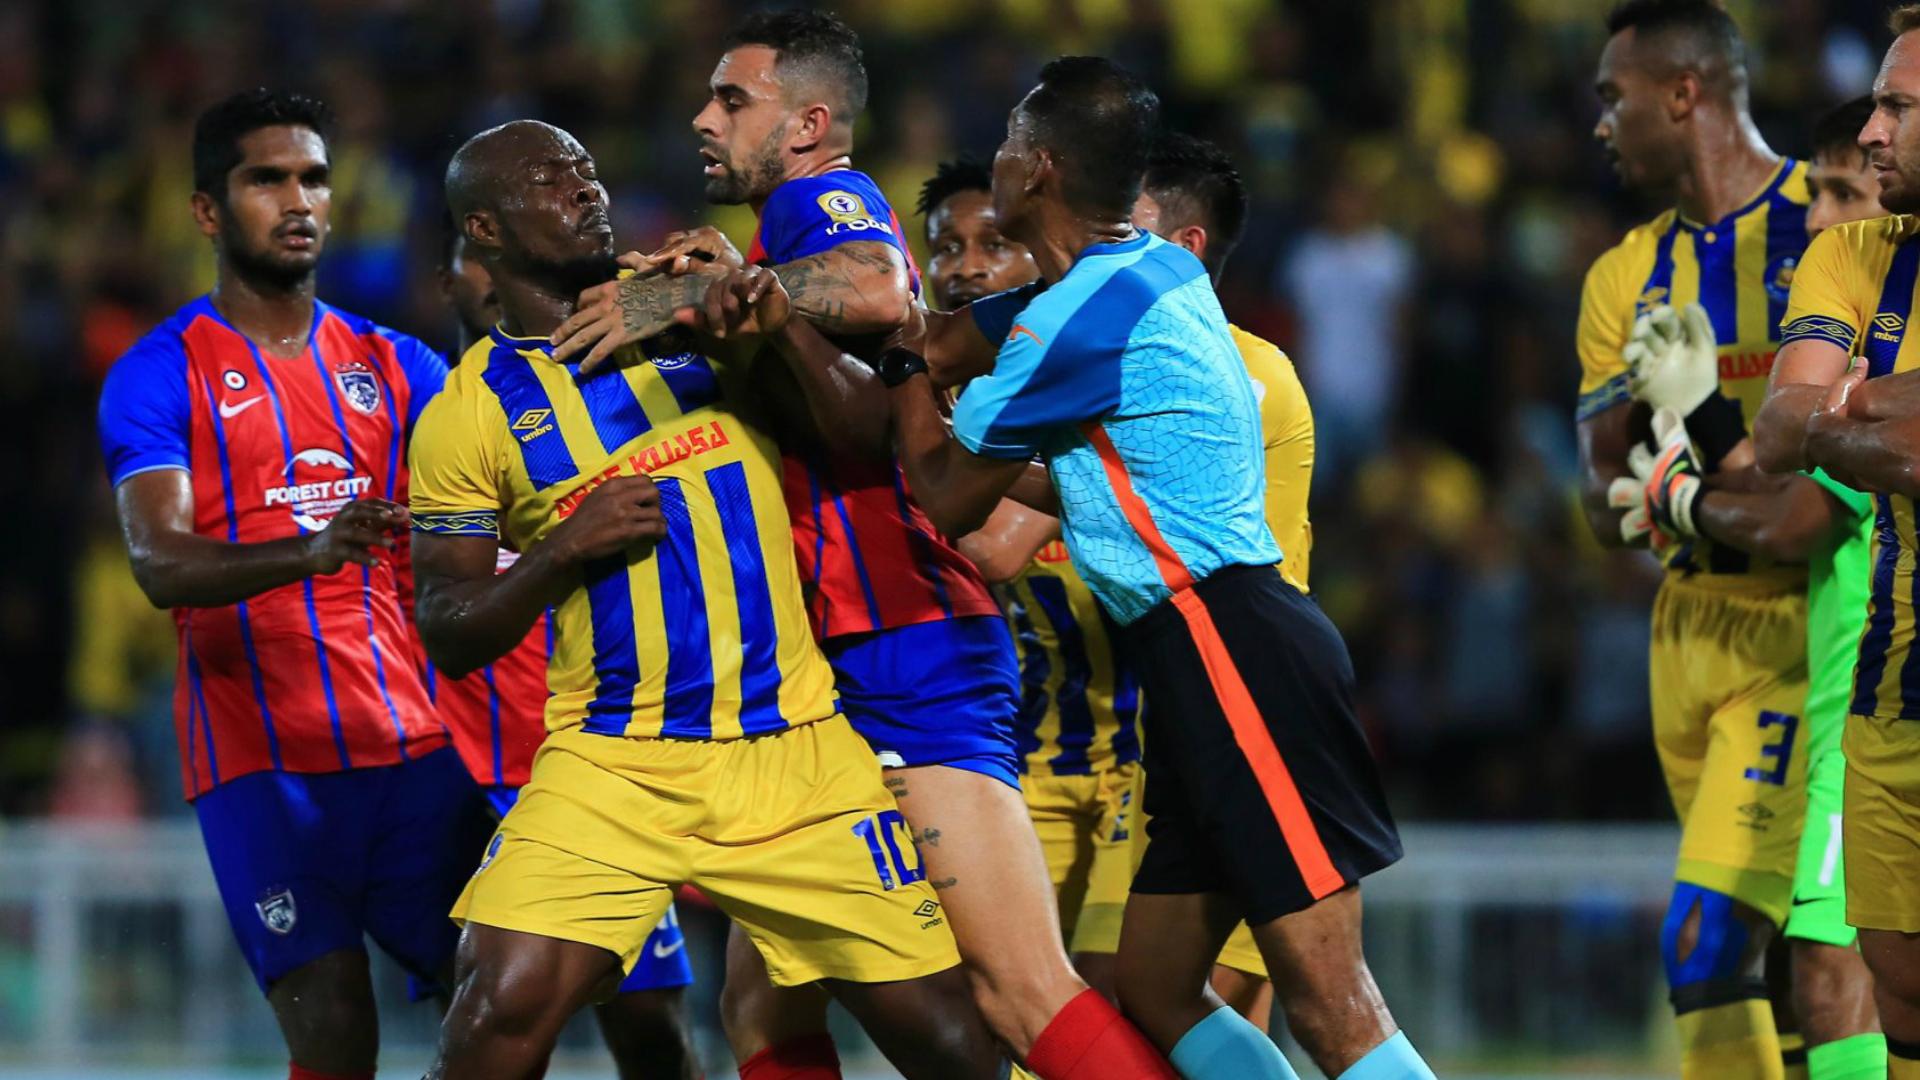 Dickson Nwakaeme, Pahang v Johor Darul Ta'zim, Malaysia Super League, 28 April 2019